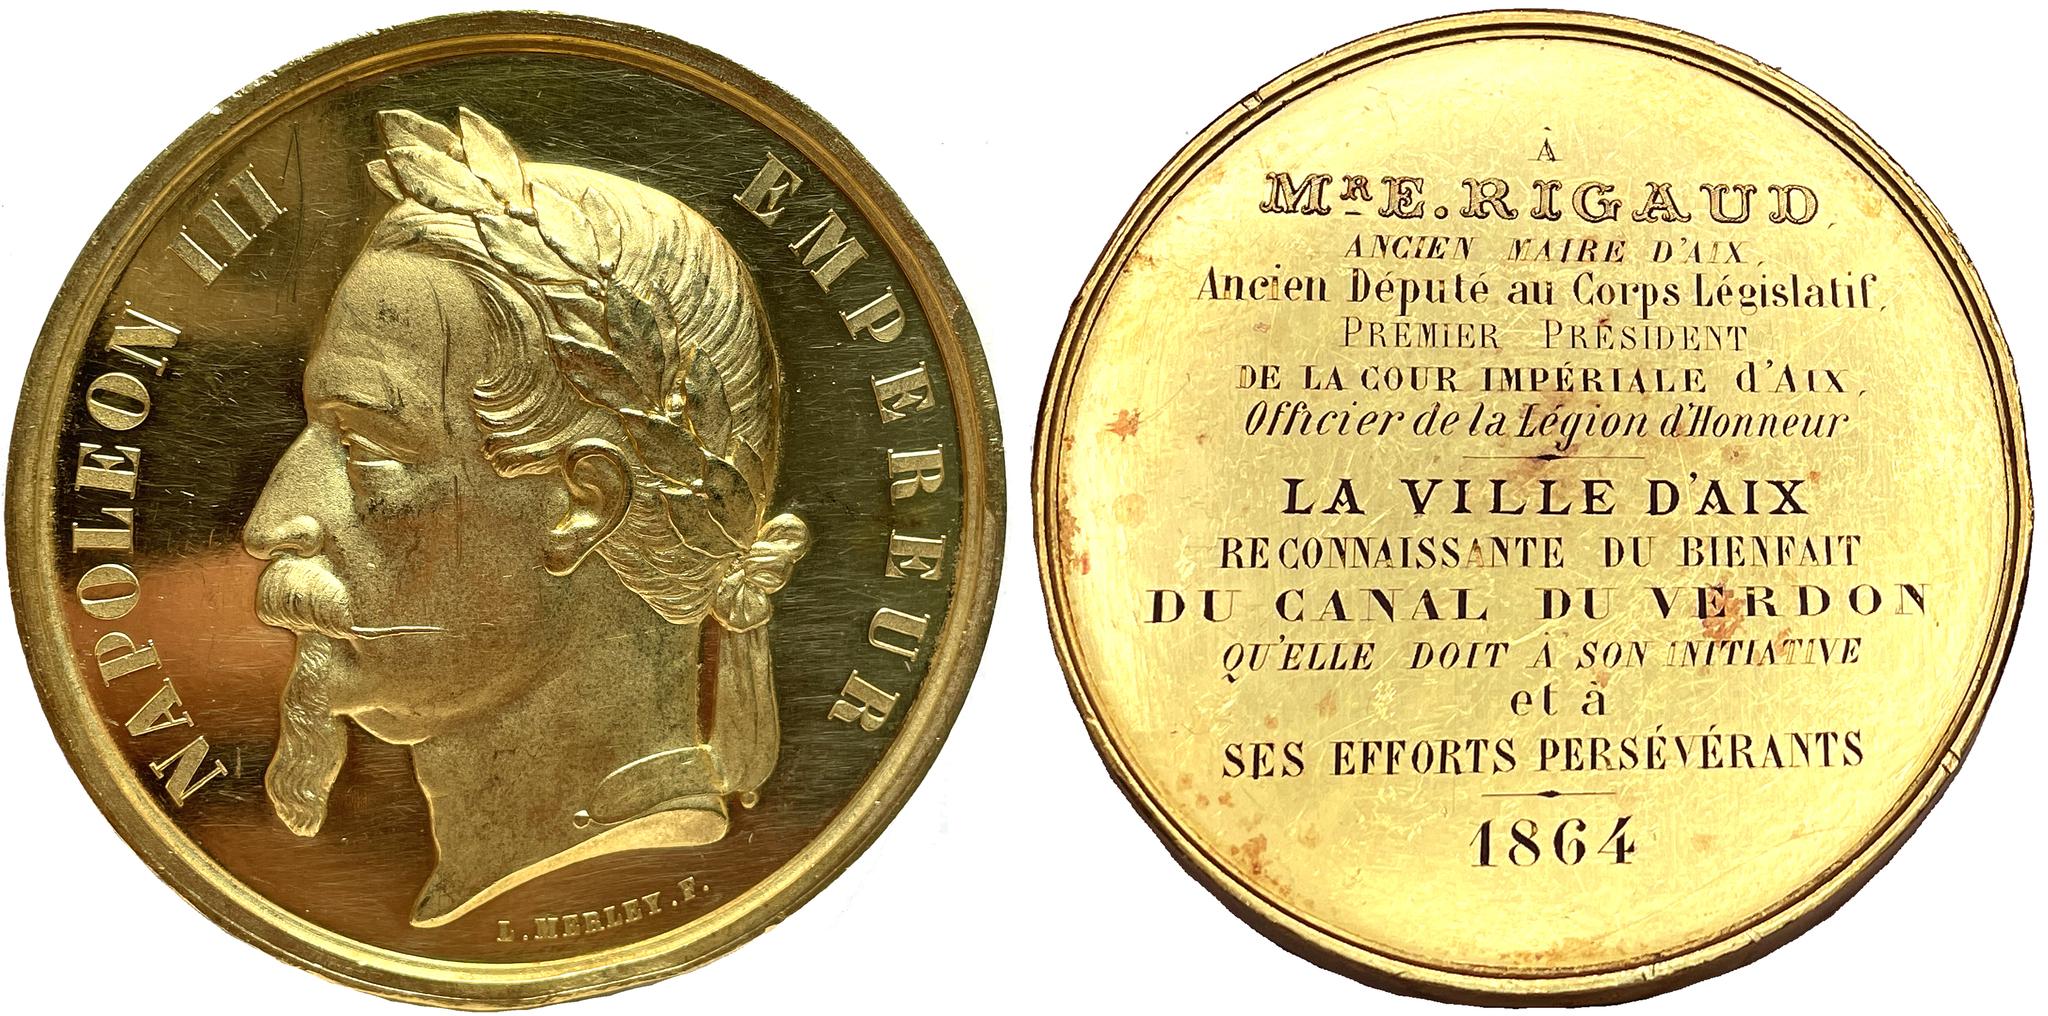 Frankrike, Napoleon III - Stor guldmedalj tilldelad borgmästaren i Aix 1864 av Merley - RRR